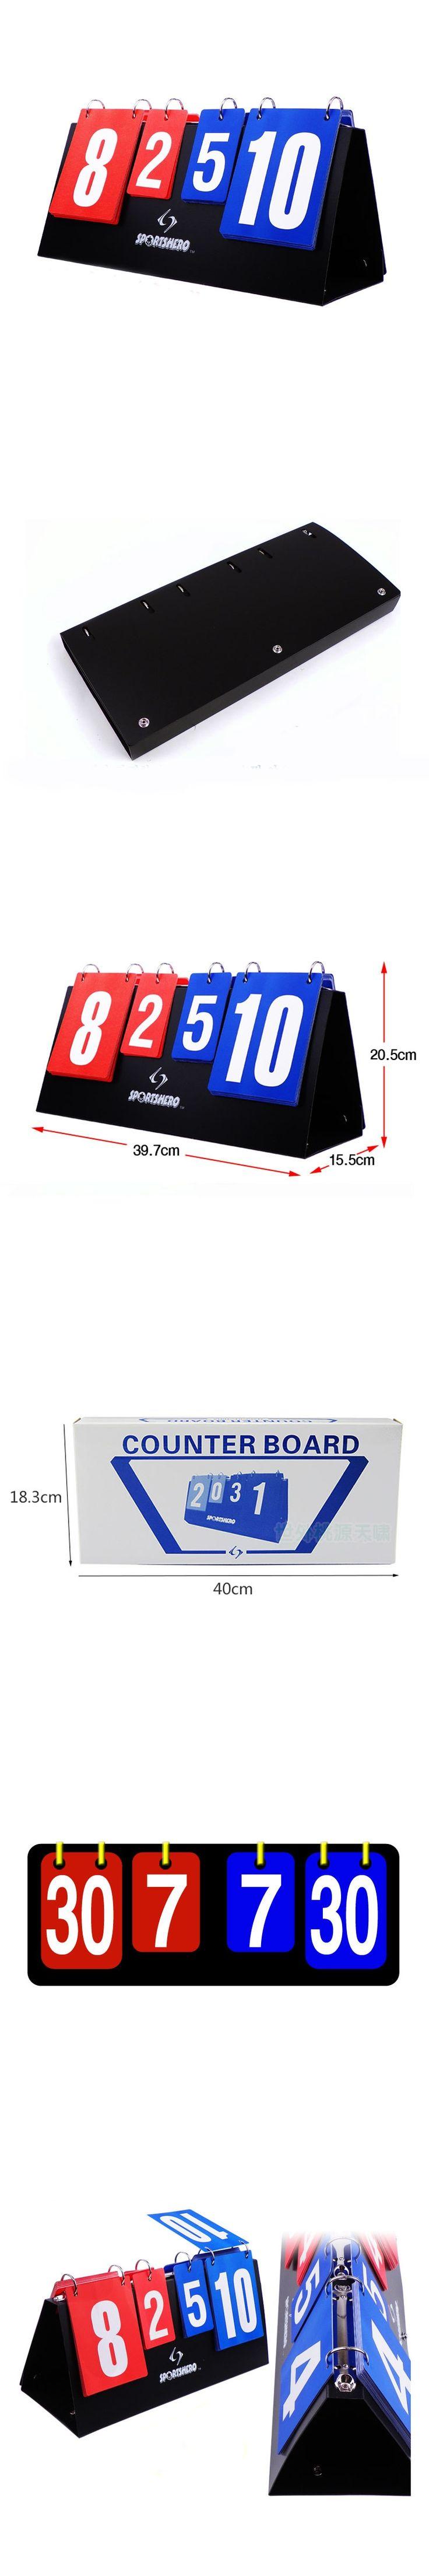 Portable basketball Score board 4 digit Sports scoreboard for volleyball table tennis handball badminton scoring Wholesale